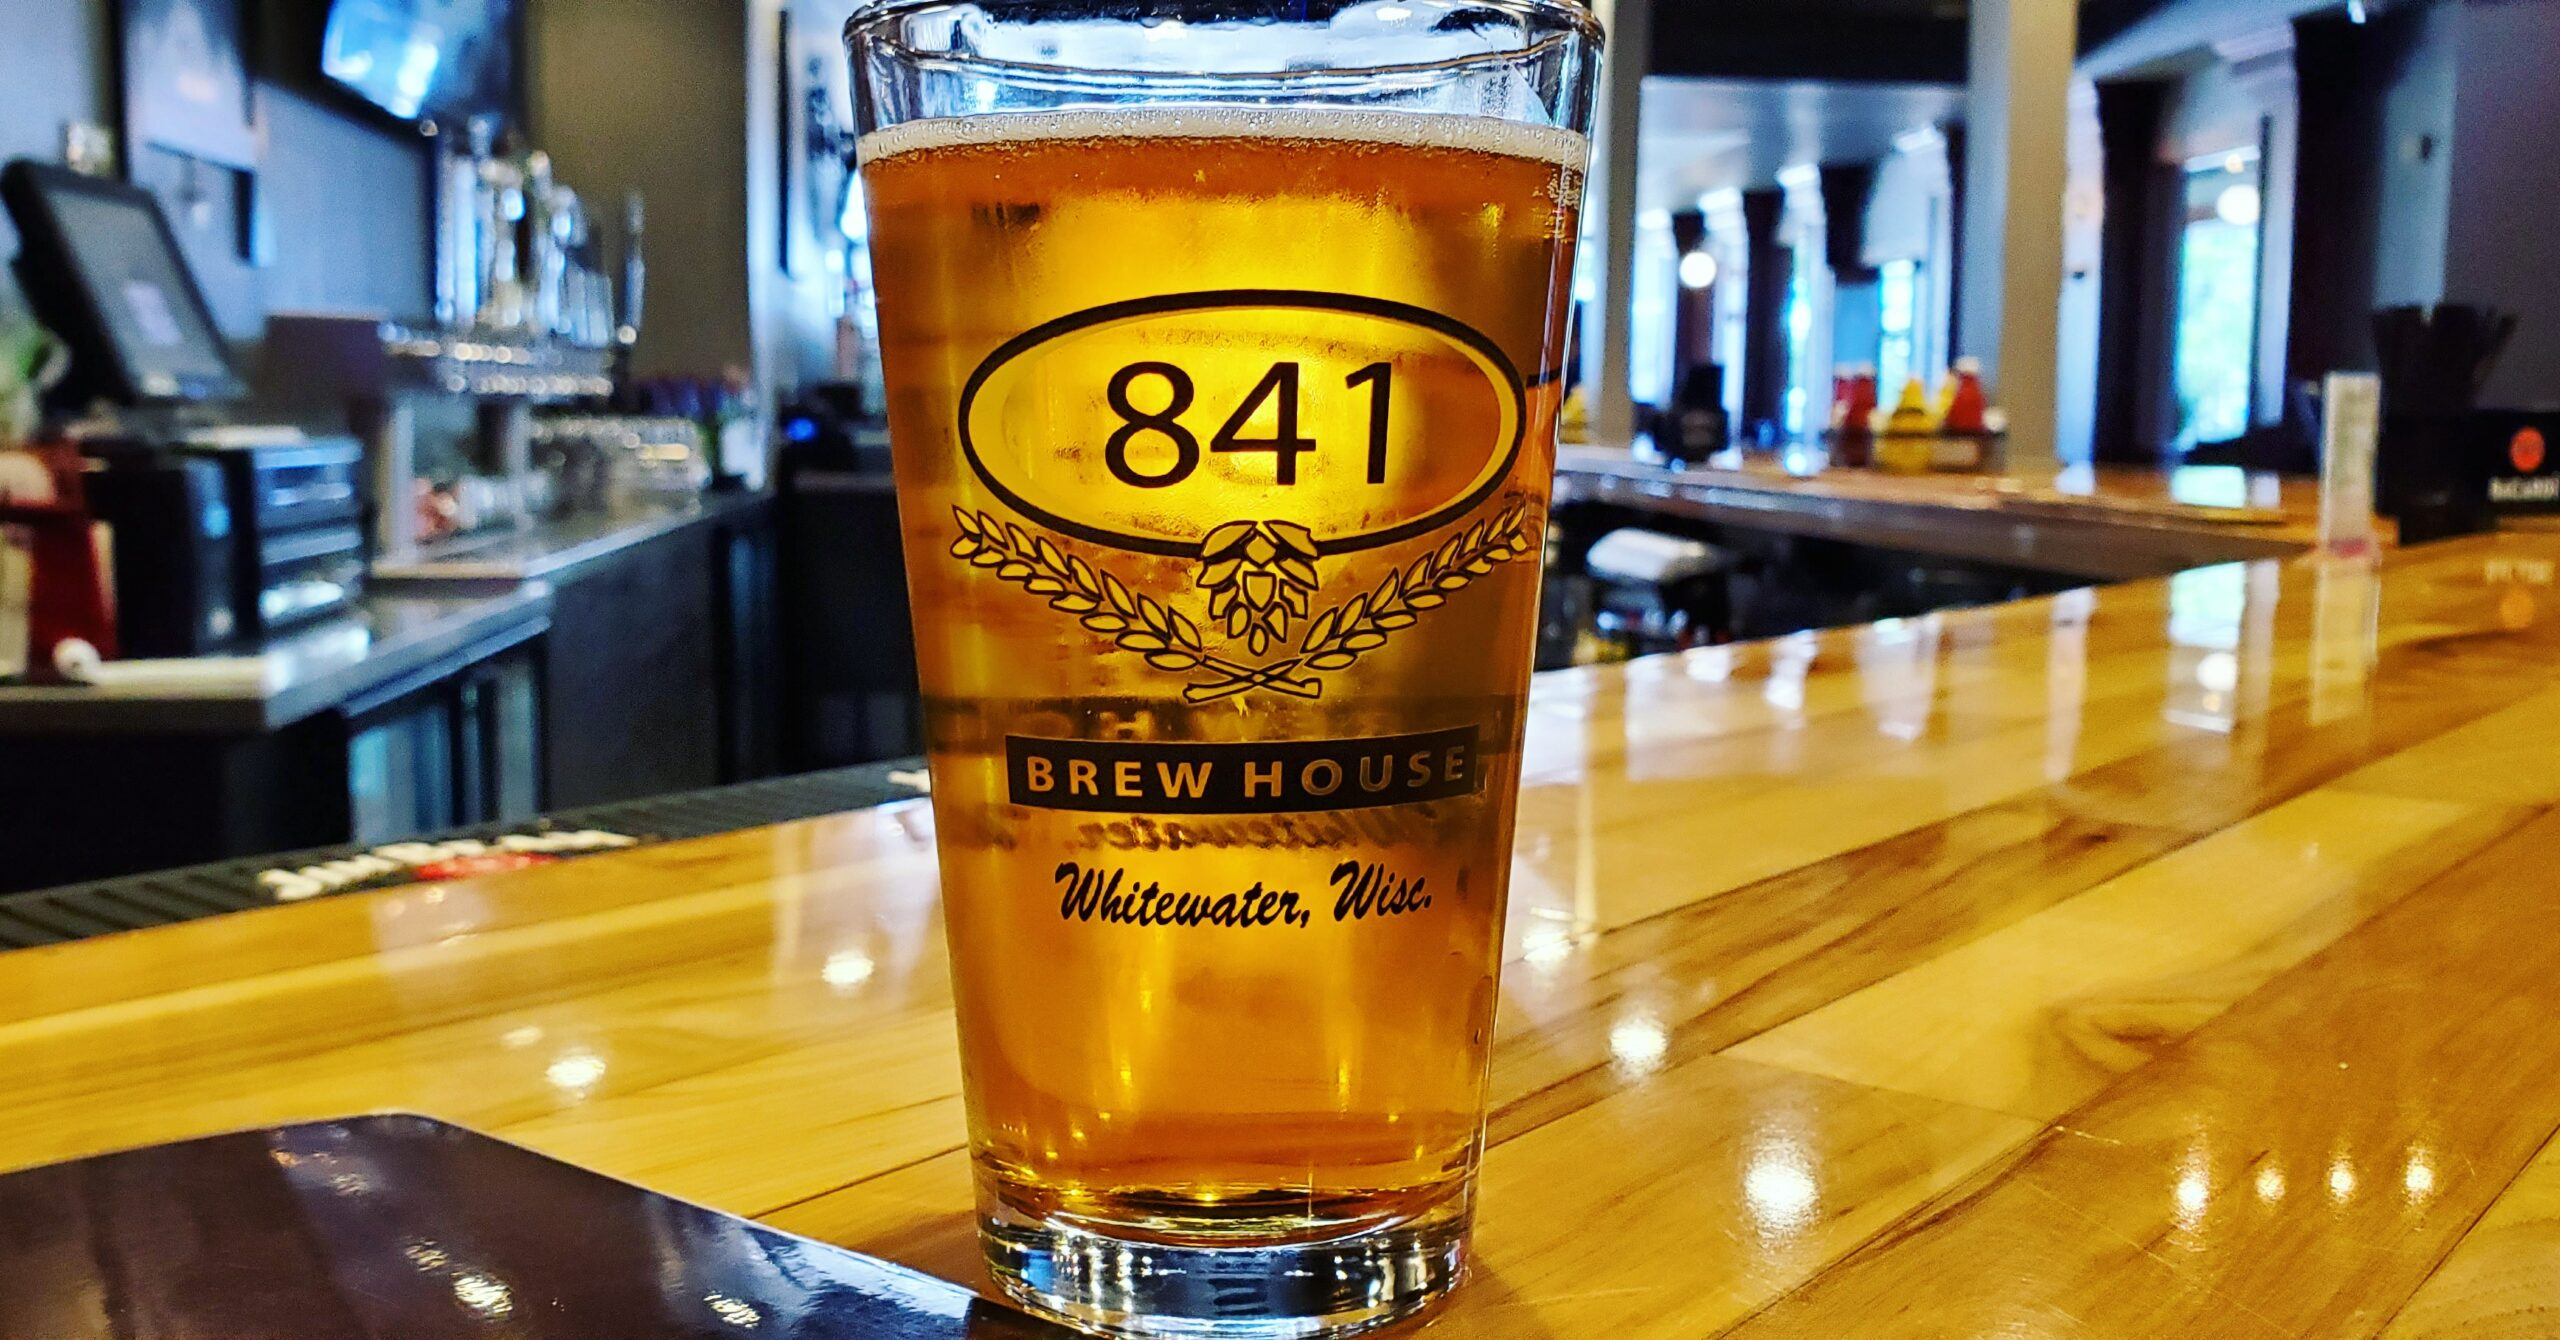 841 Brew House